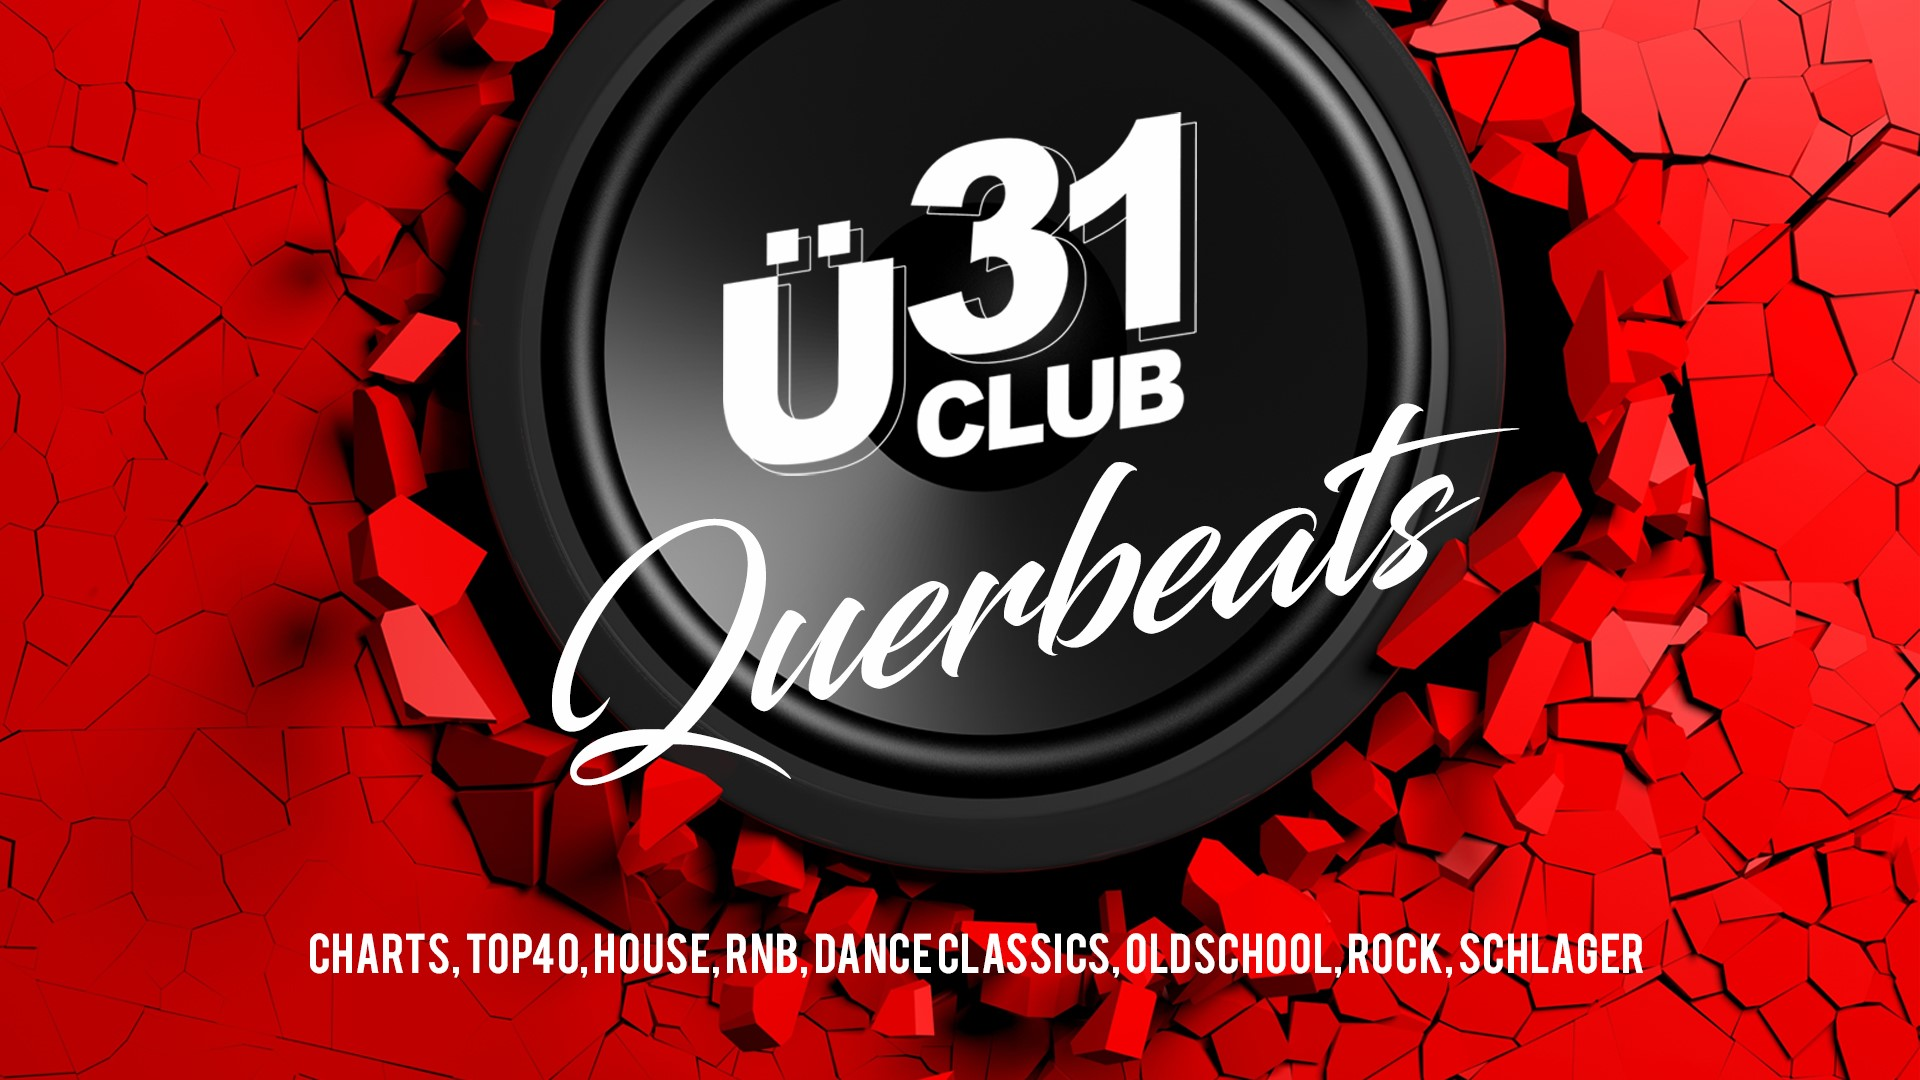 Ü31 Club Berlin - QUERBEATS